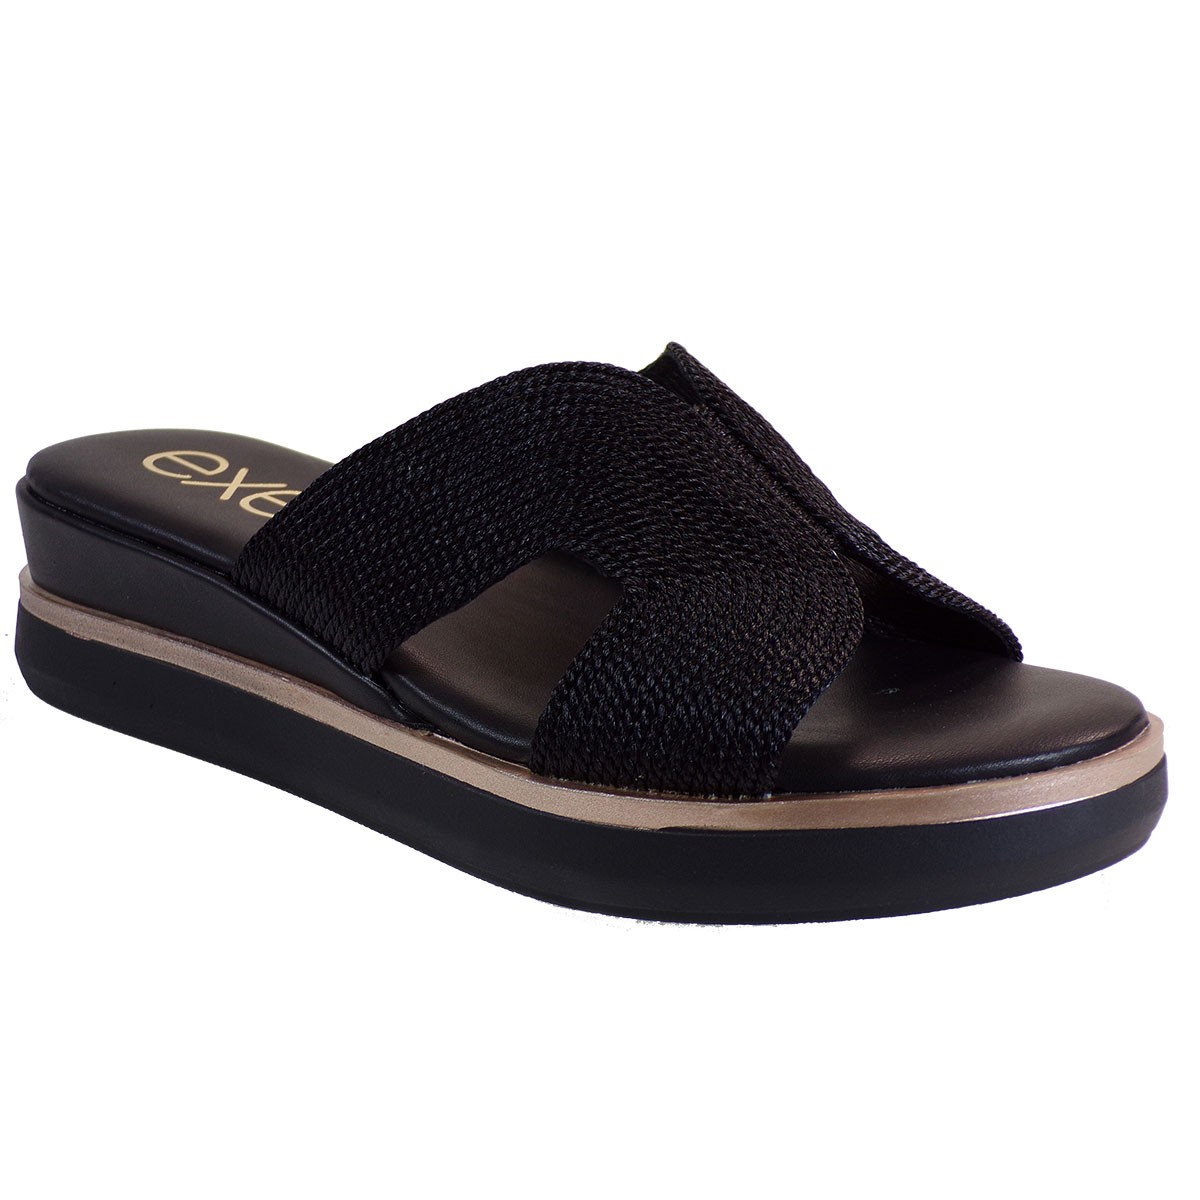 EXE Shoes Γυναικεία Παντόφλας Πλατφόρμες AMANTA -365 Μαύρο Μακραμε M47003652P11